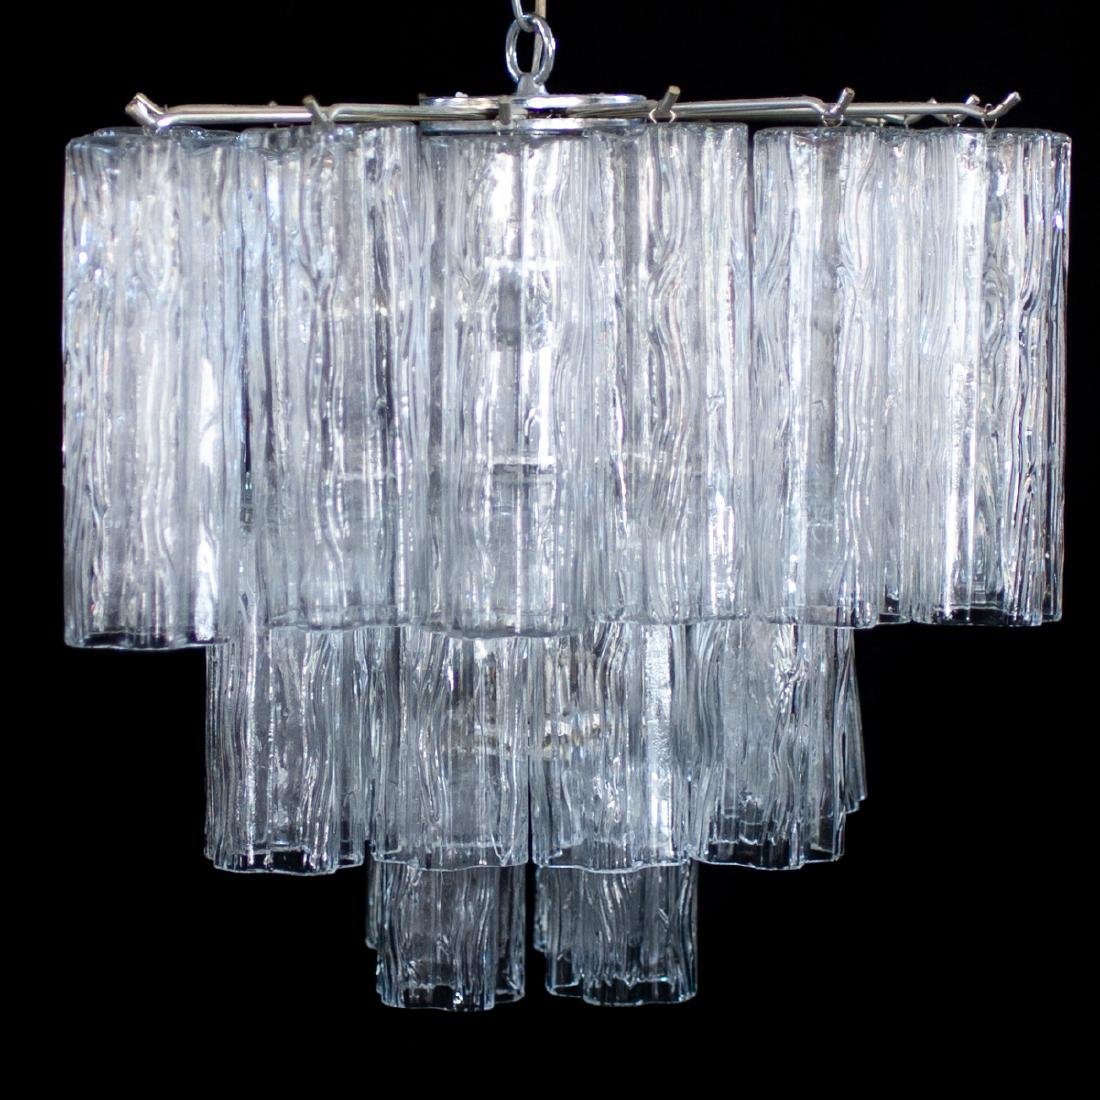 Vintage Camer Murano Glass Chandelier - 2